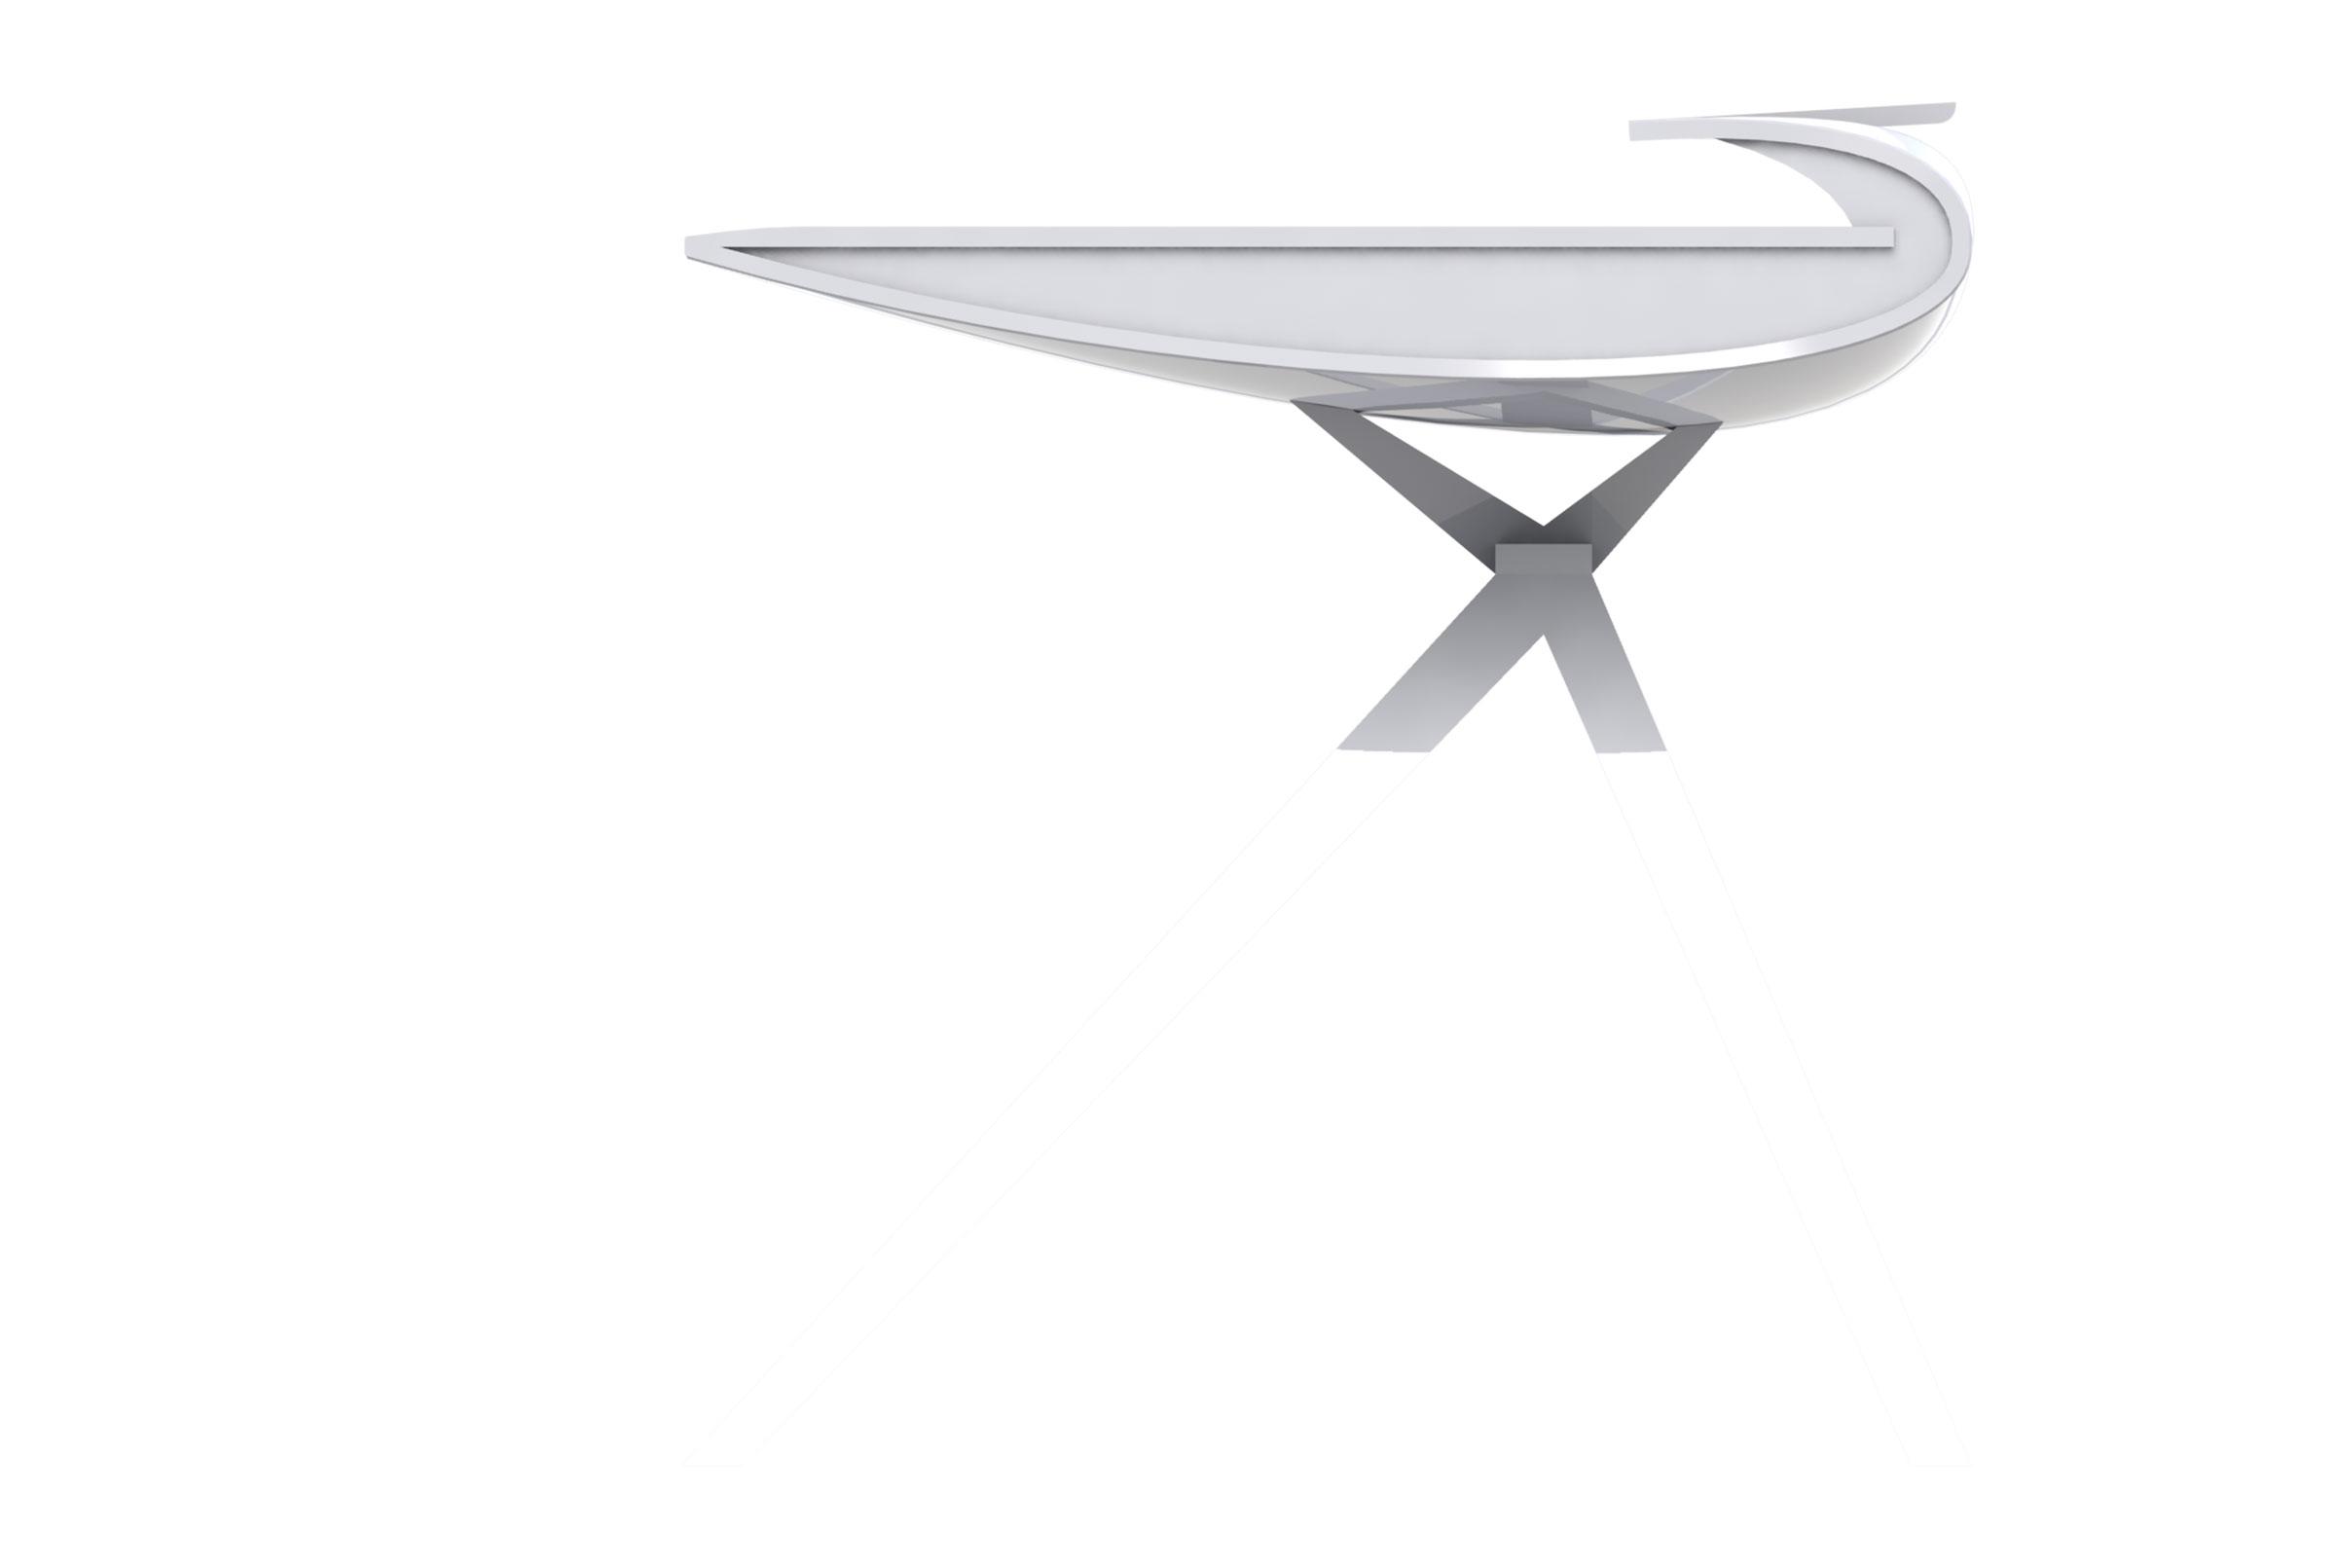 table5-1@2x.jpg